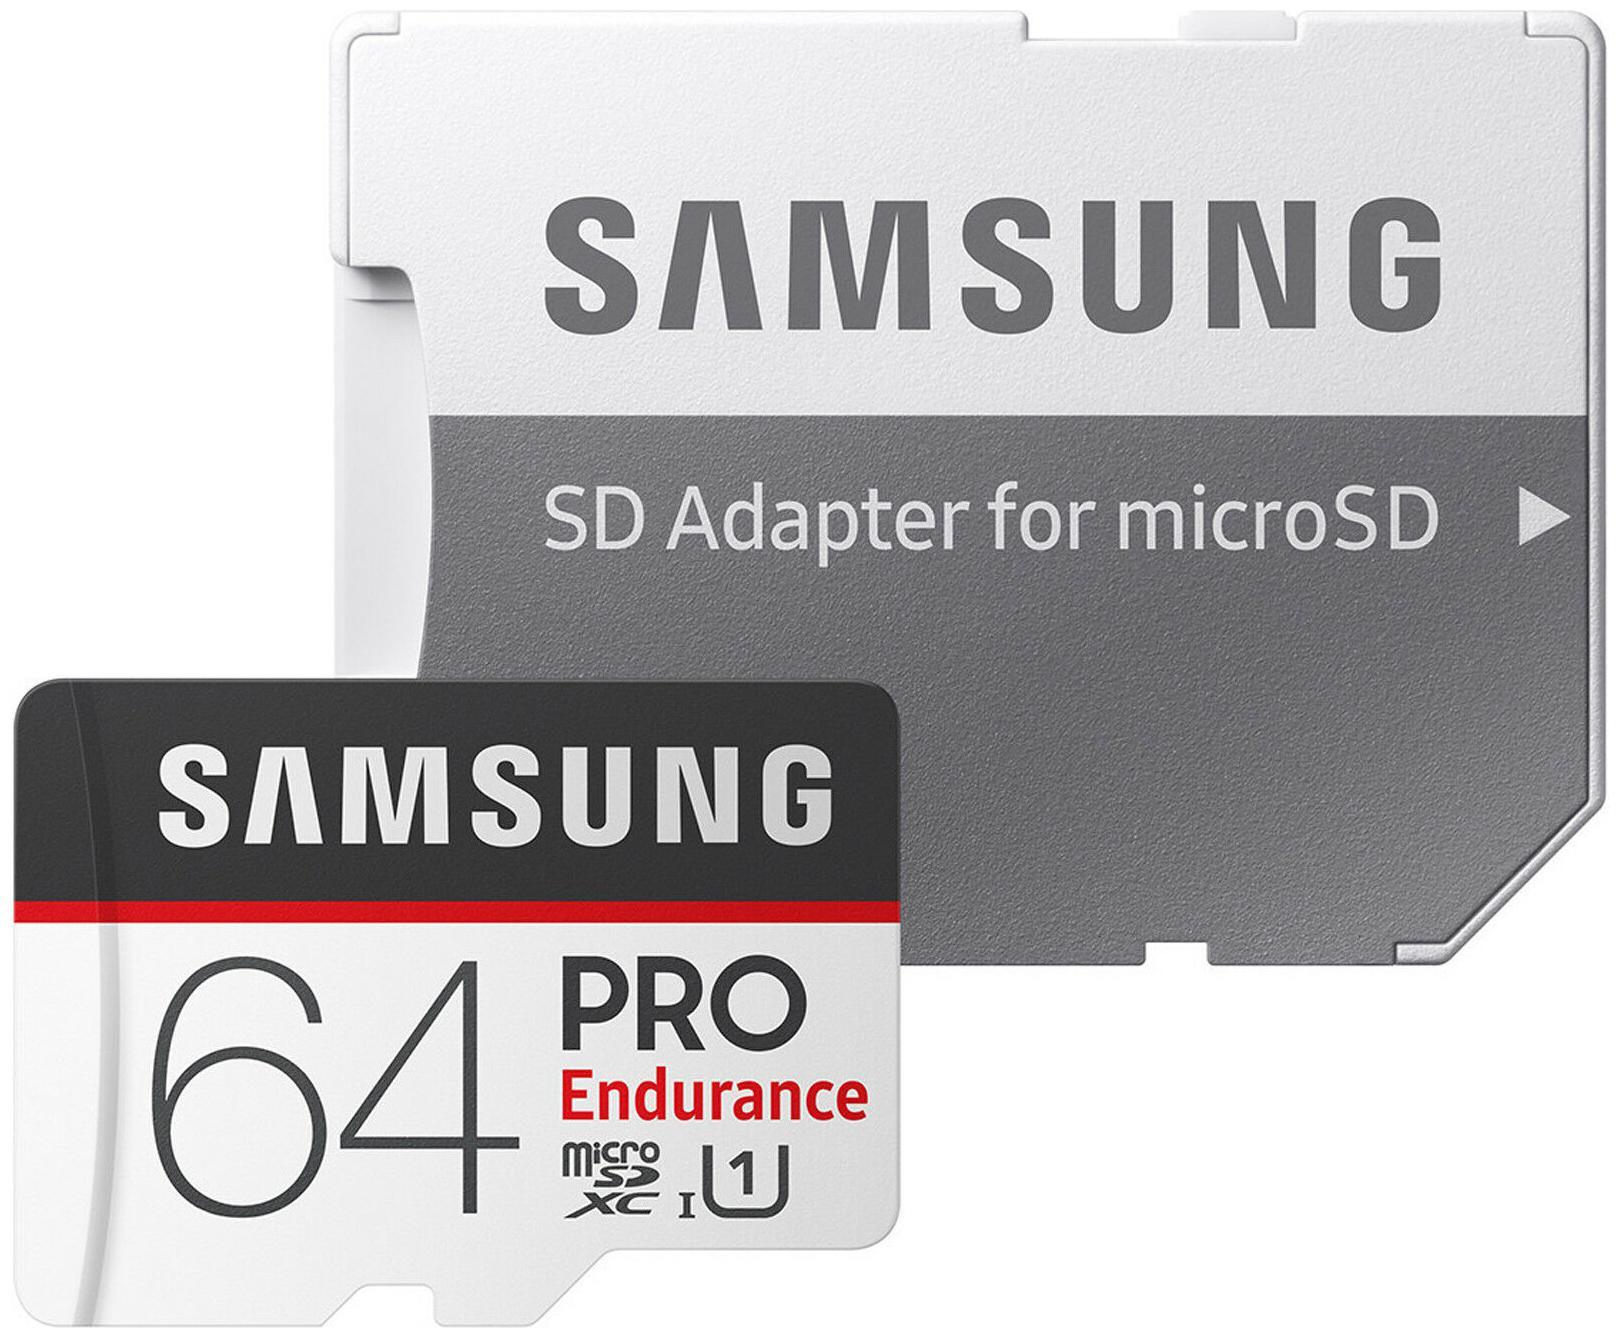 US Seller PRO Endurance Samsung Memory 64 GB 64  GB Micro SD SDXC MicroSD Class 10